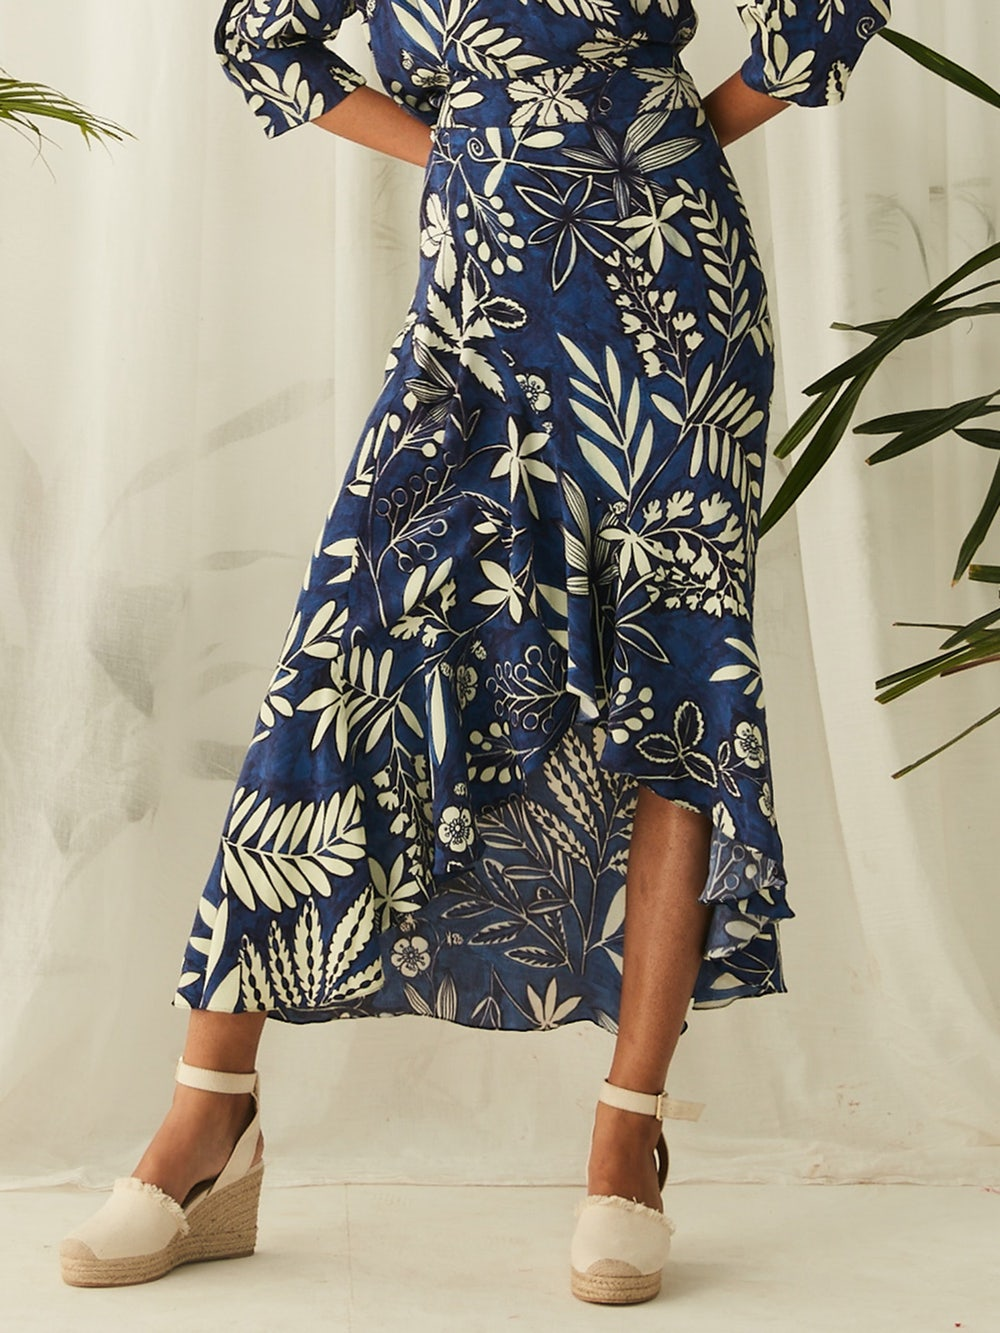 Blue Floral Print Ruffle Skirt